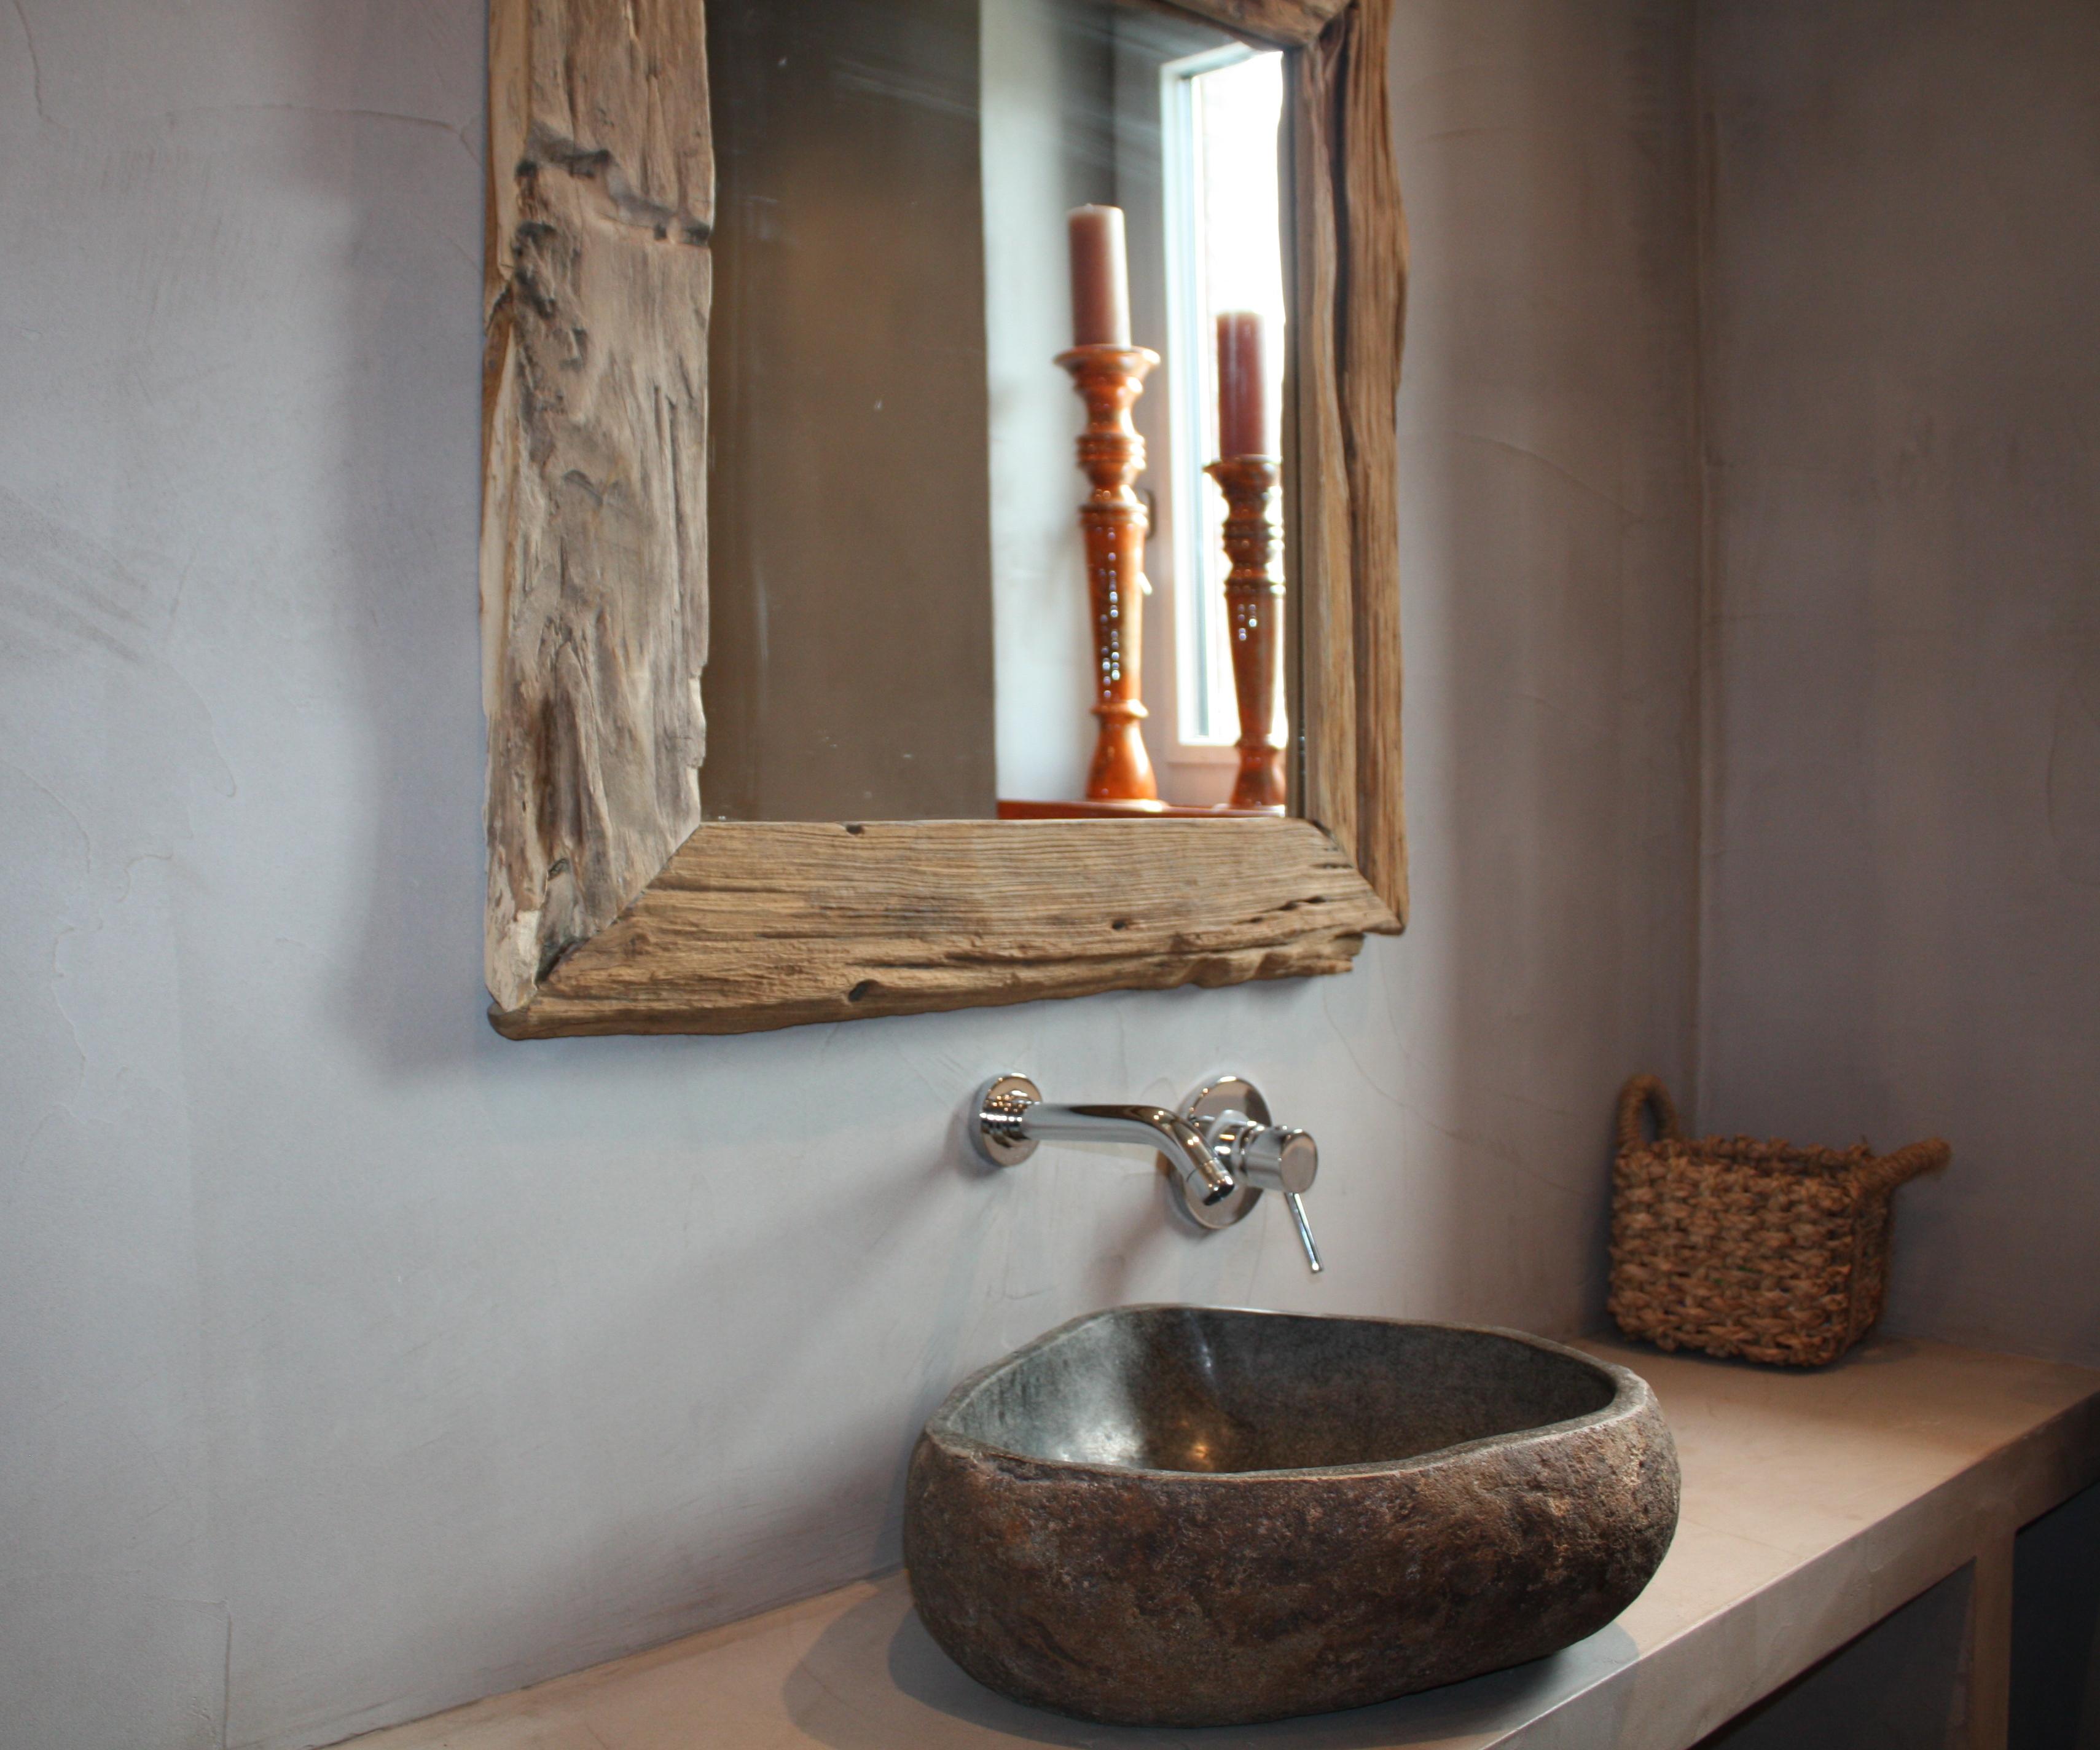 Stucwerk Badkamer Kosten : Beton in badkamer. simple beton cire badkamer modern with beton in